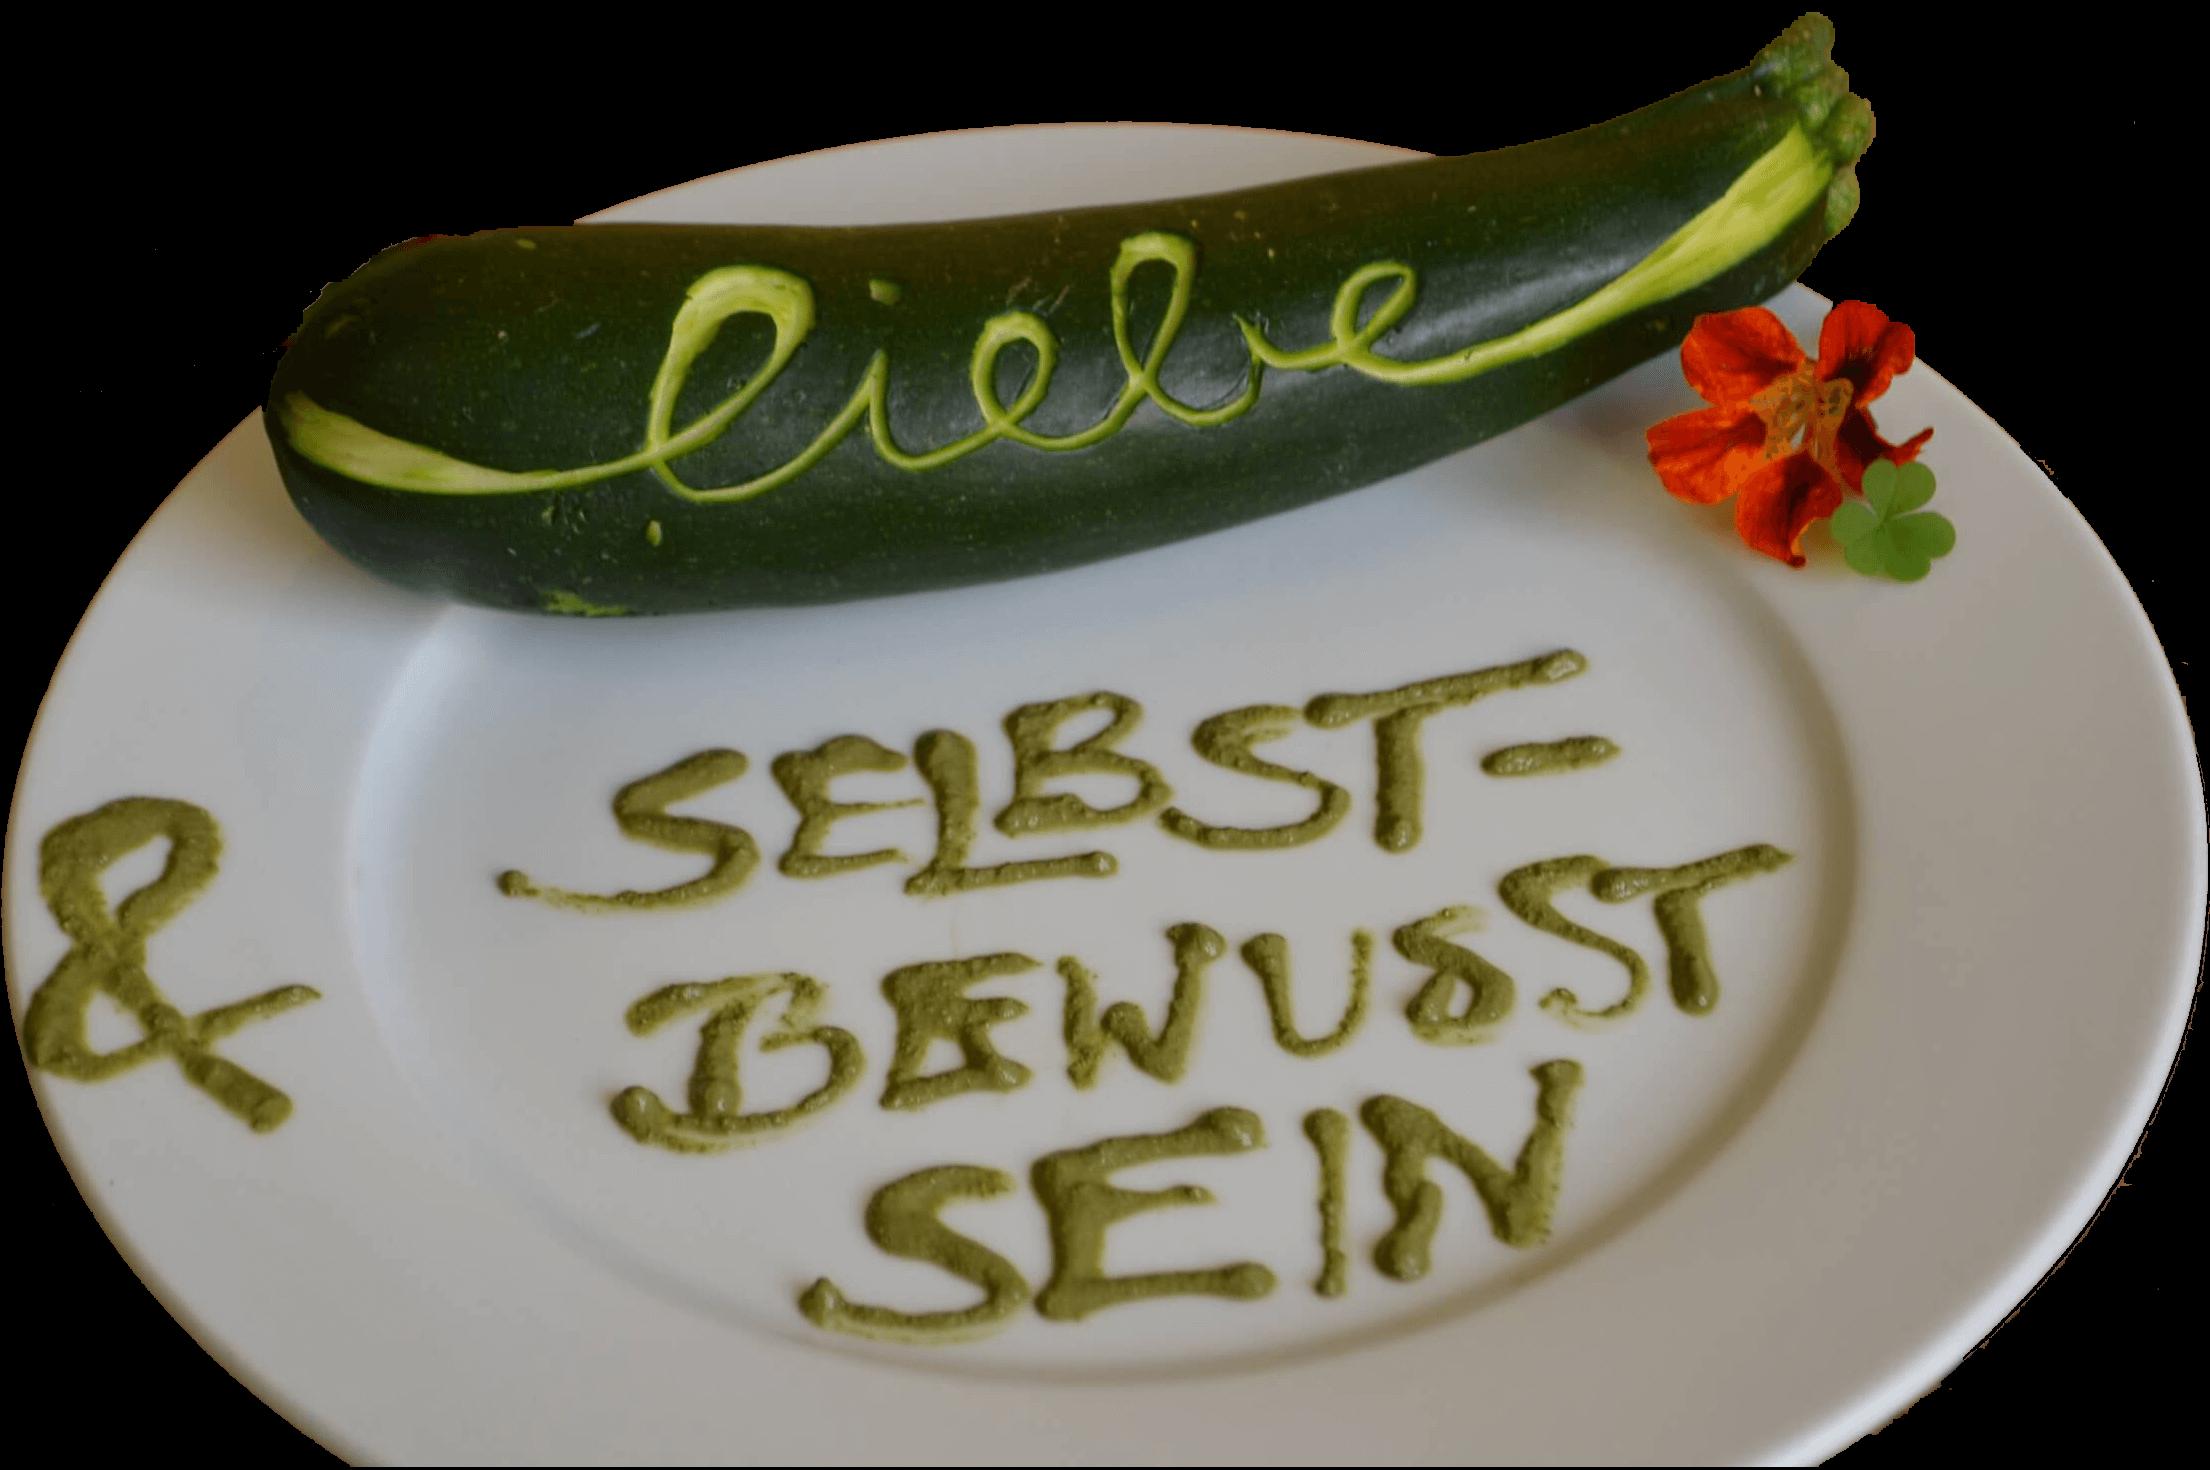 liebe_uselbst(1)